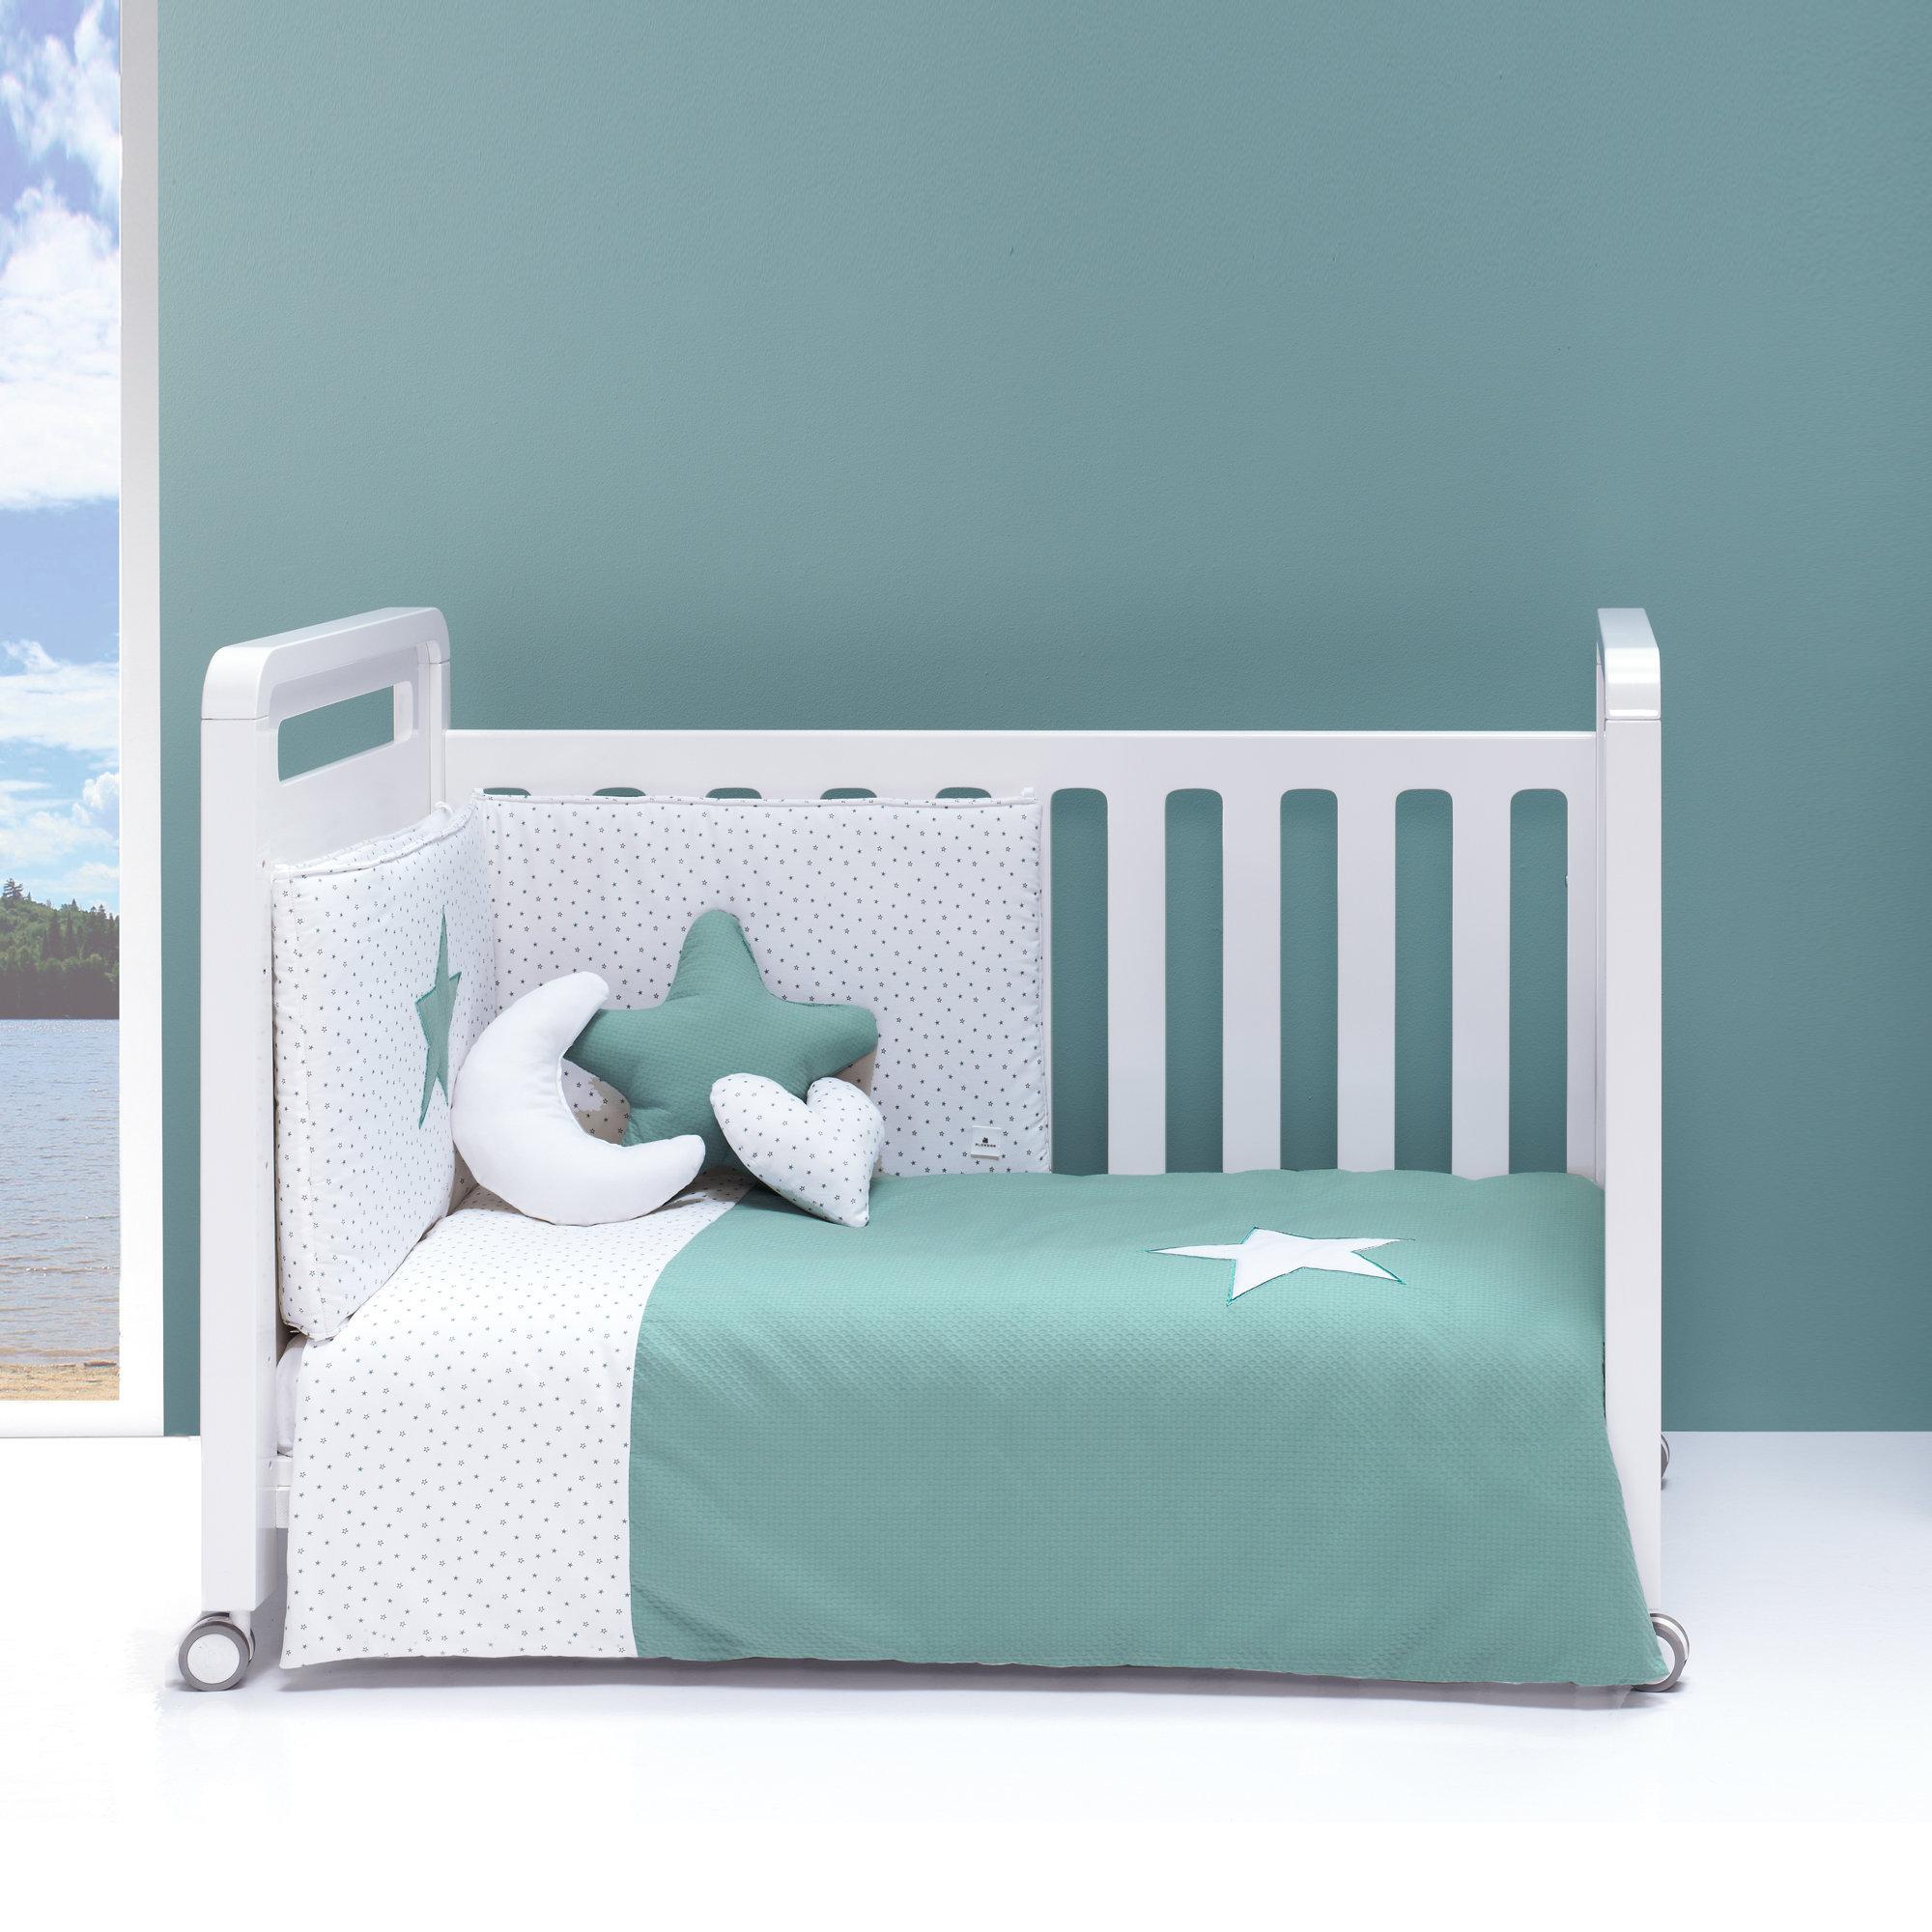 Colección textil para cuna de bebé en color verde agua turquesa